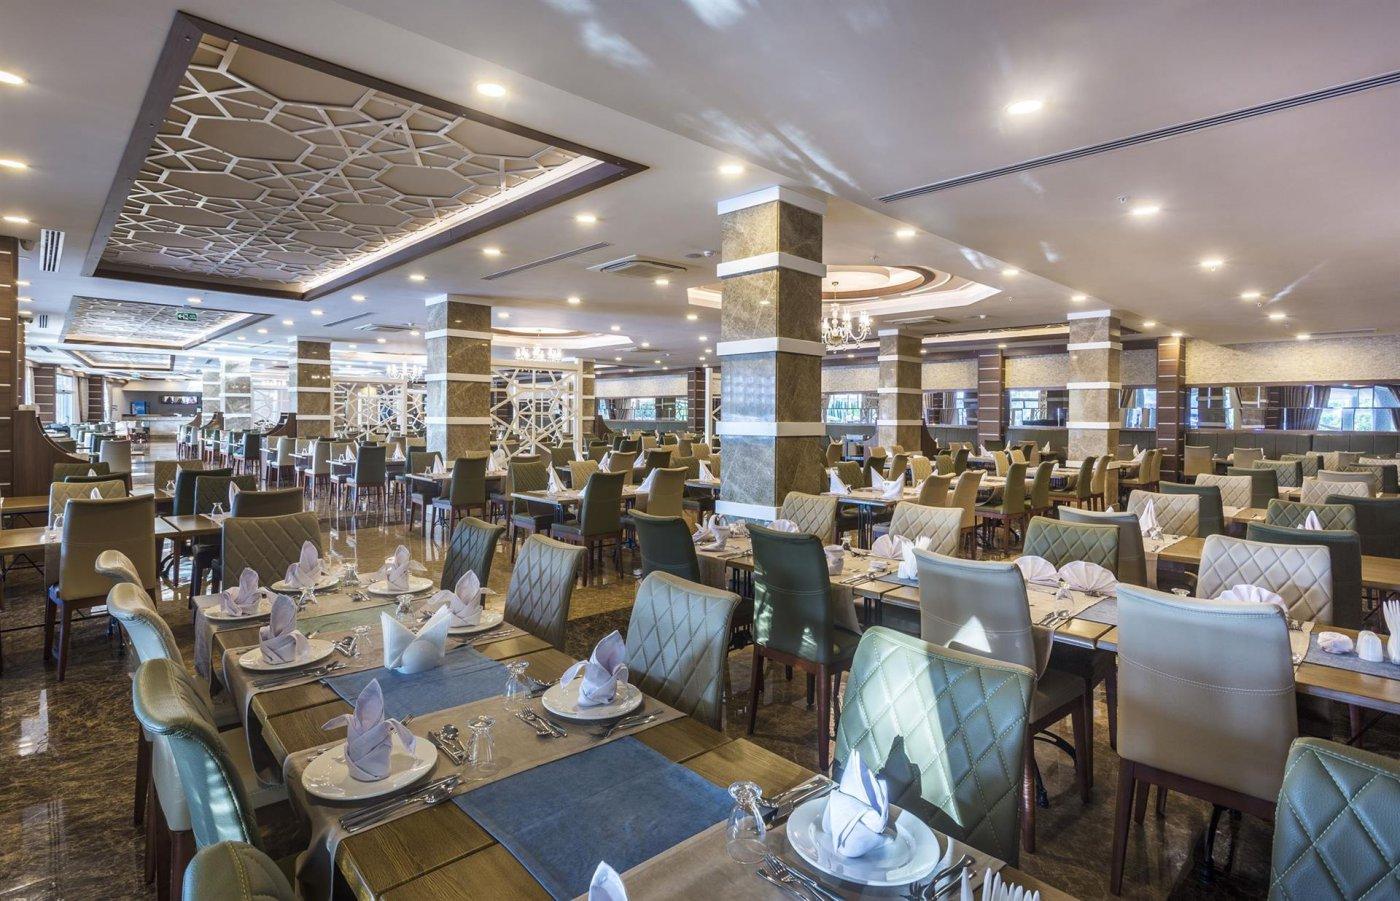 Ресторан Lonicera Resort & Spa 5* (Лонисера Резорт энд Спа 5*)